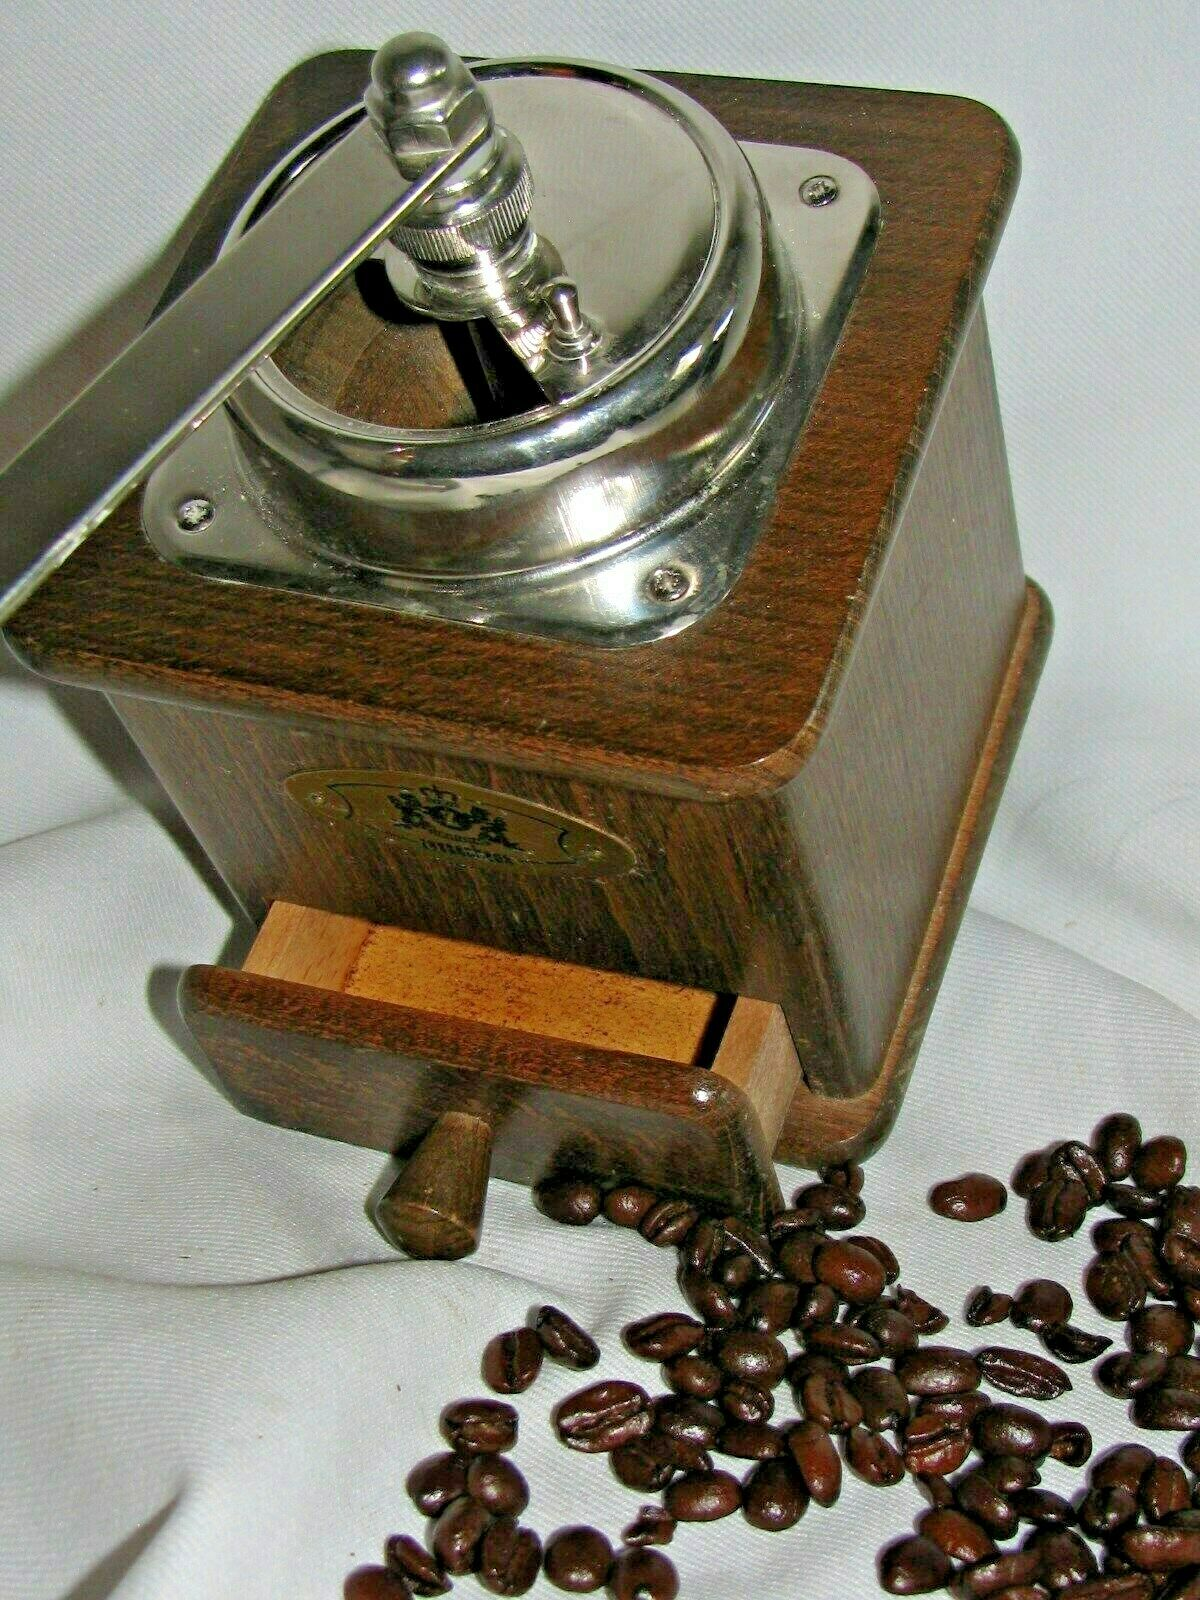 ZASSENHAUSE MANUAL COFFEE MILL GRINDER  MODEL BRASILIA  BEECH